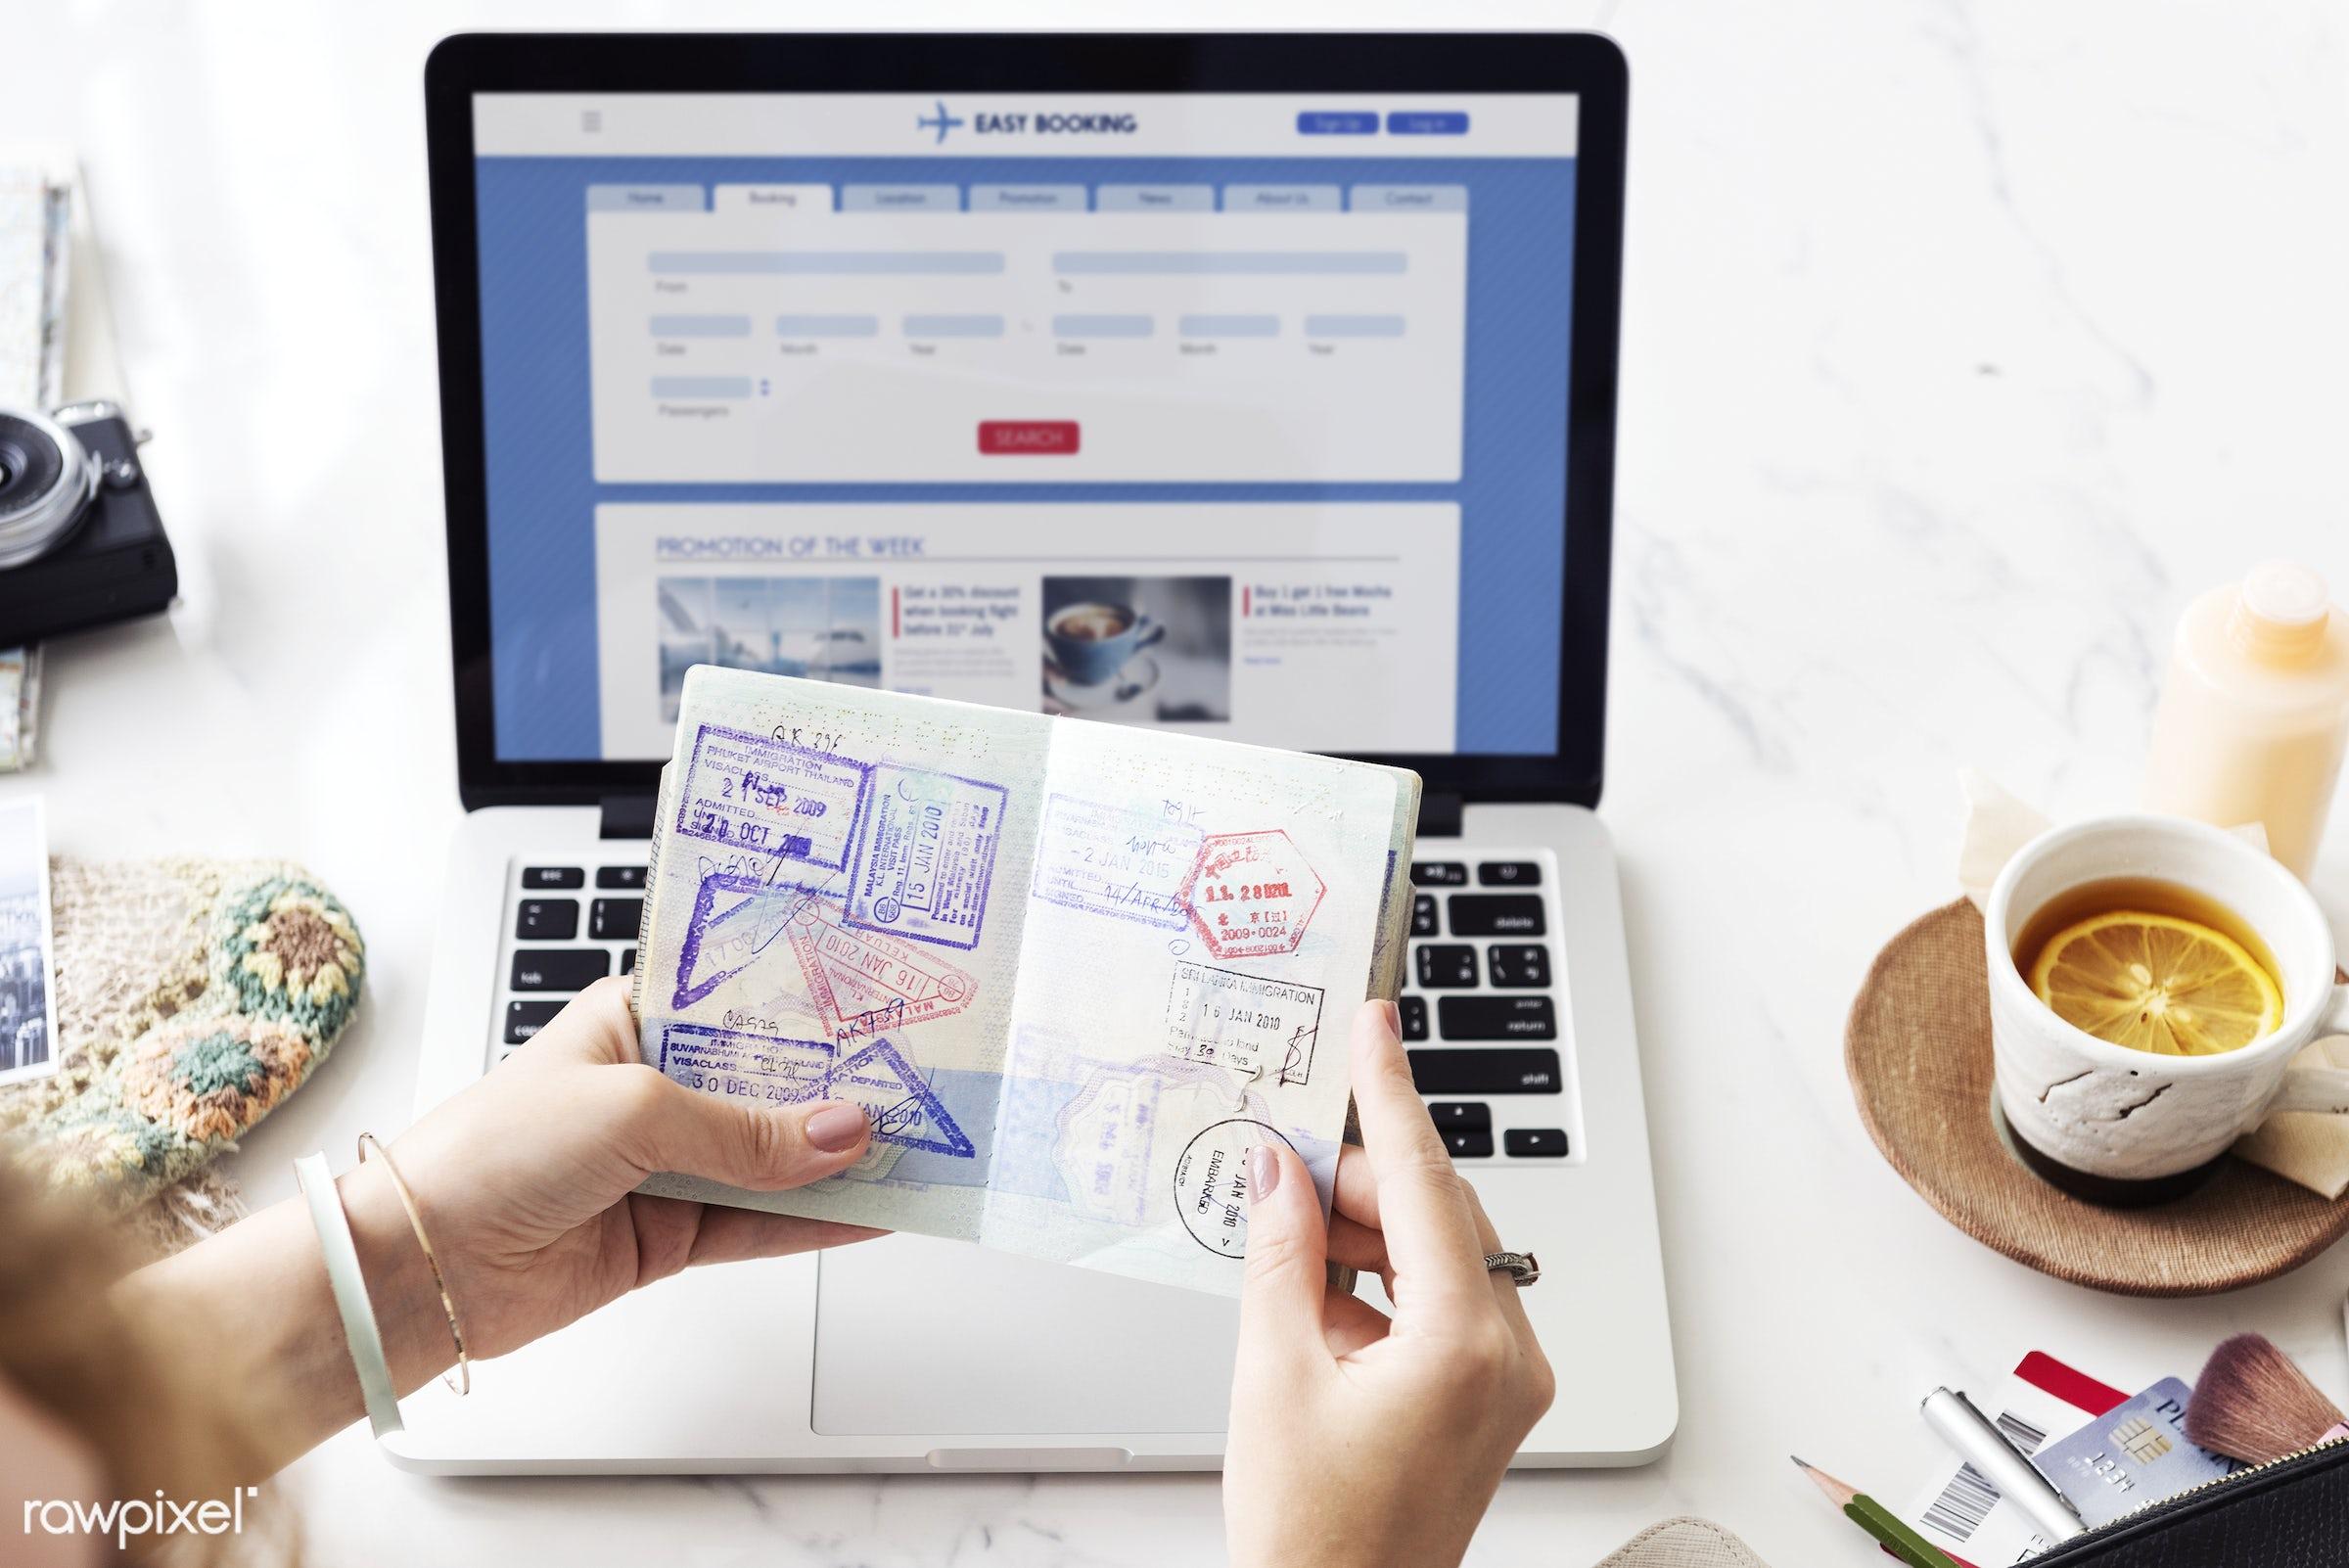 Booking flight online - passport, communication, computer, connection, device, digital, explore, internet, journey, laptop,...